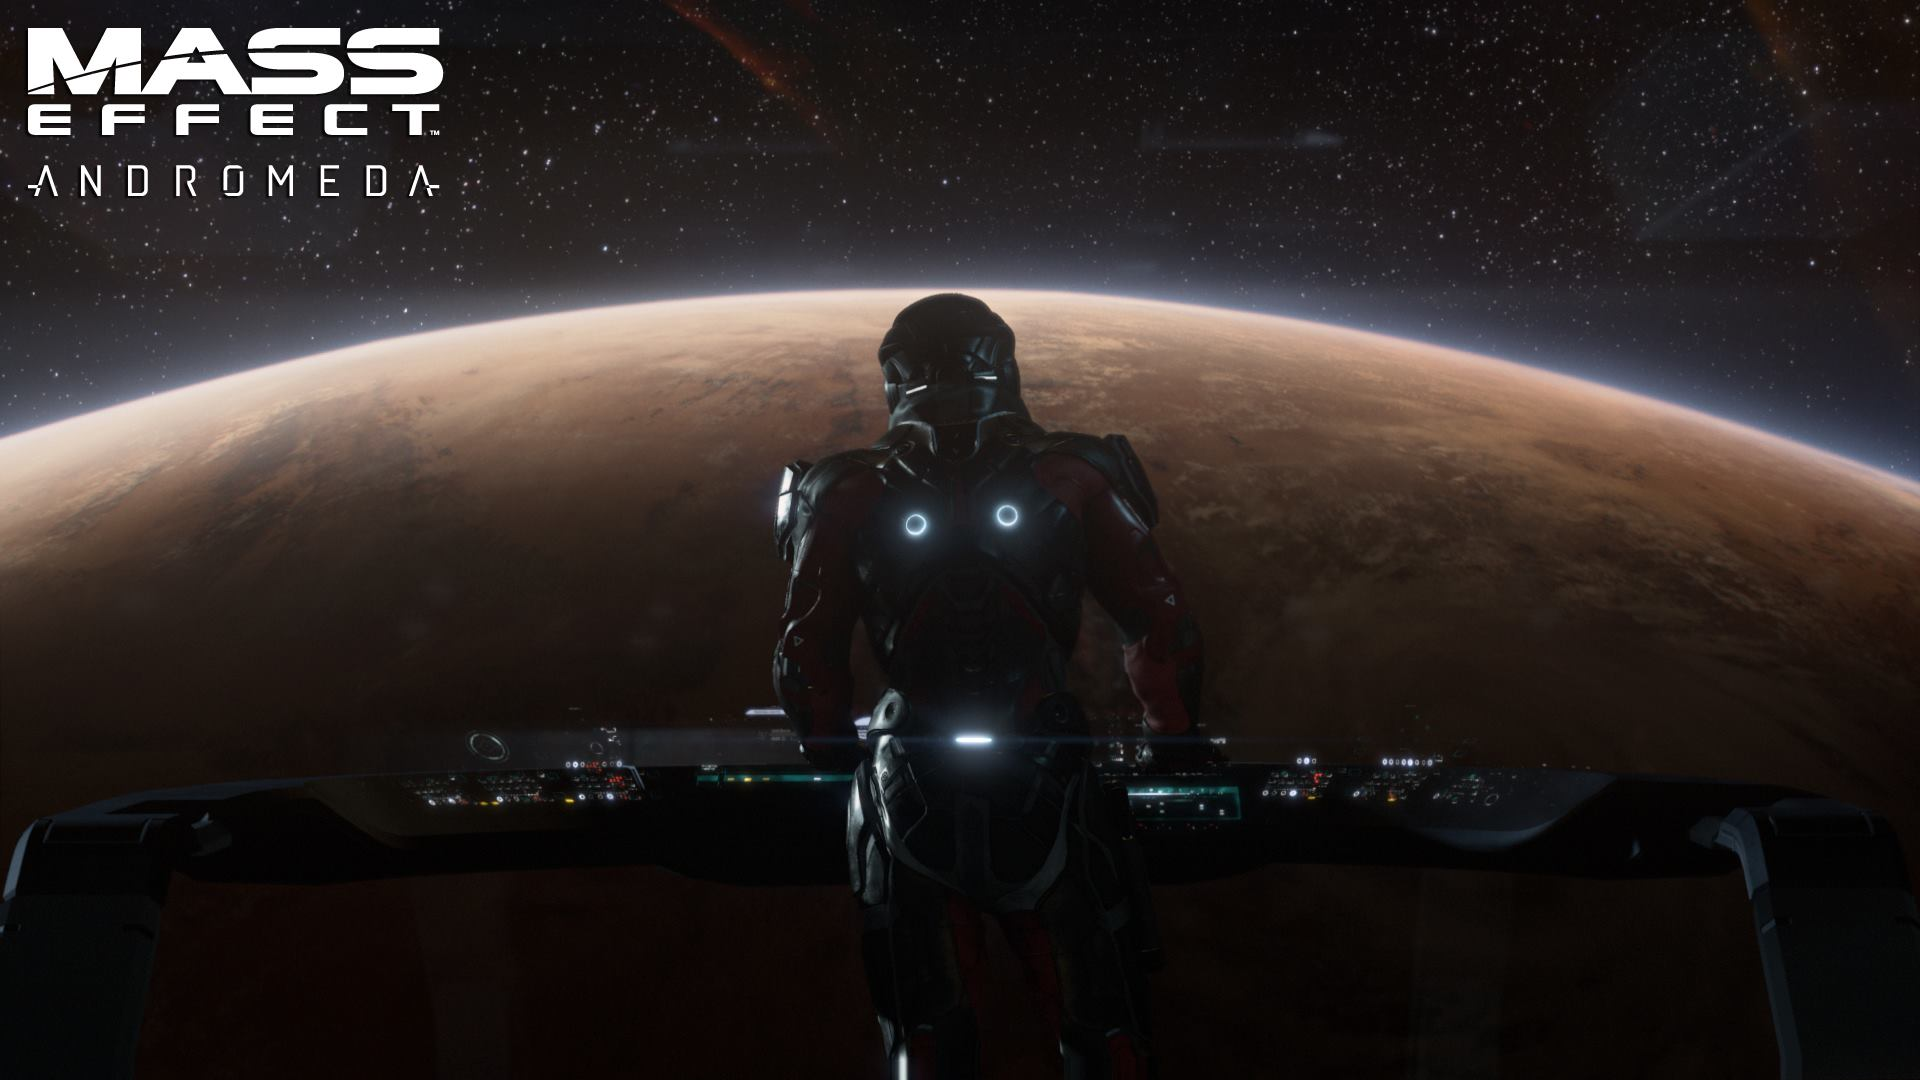 Mass Effect Andromeda. Не коротко о главном. - Изображение 29